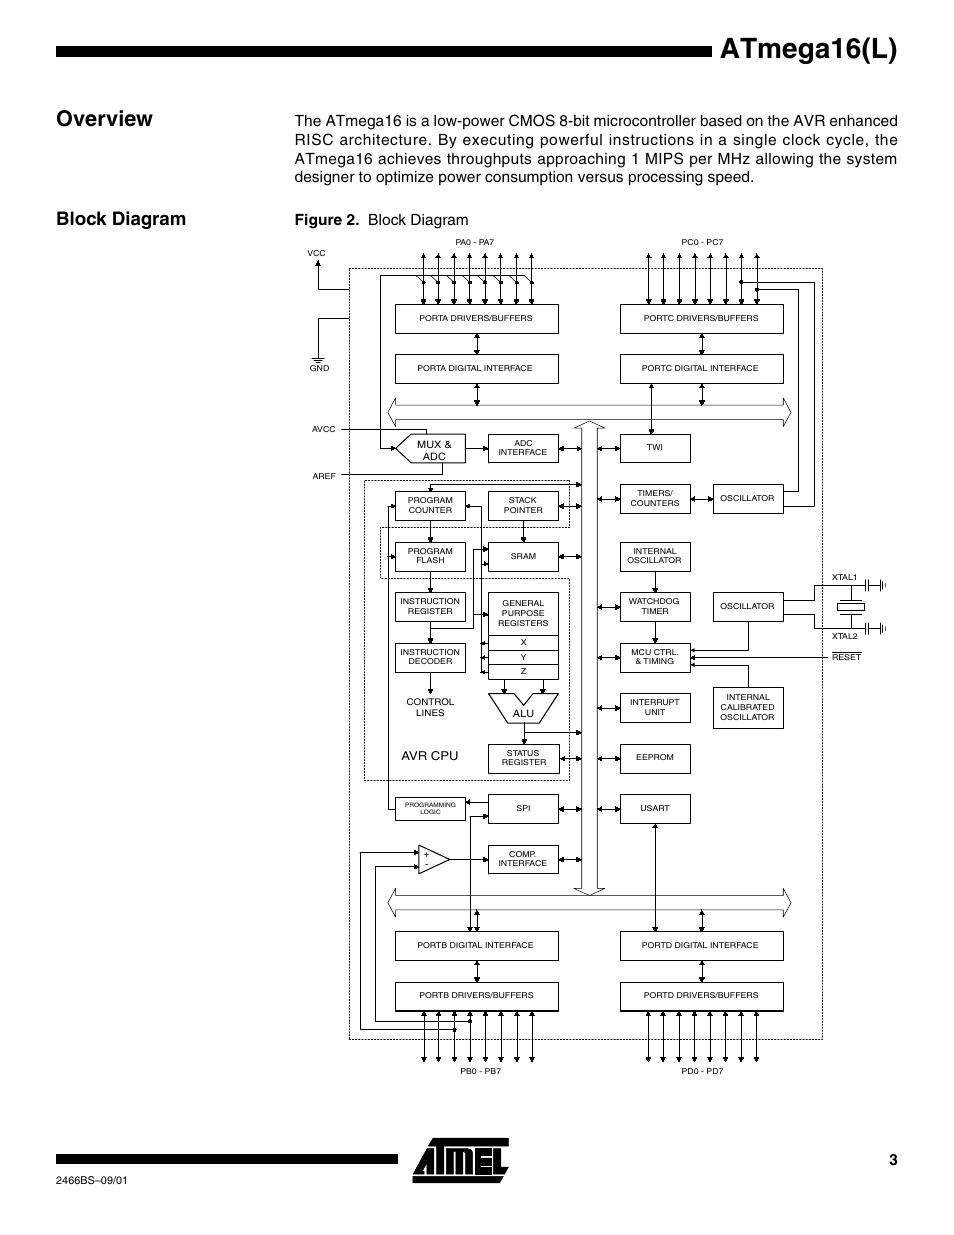 Overview Block Diagram Atmega16l Rainbow Electronics Atmega16p Electronic User Manual Page 3 14